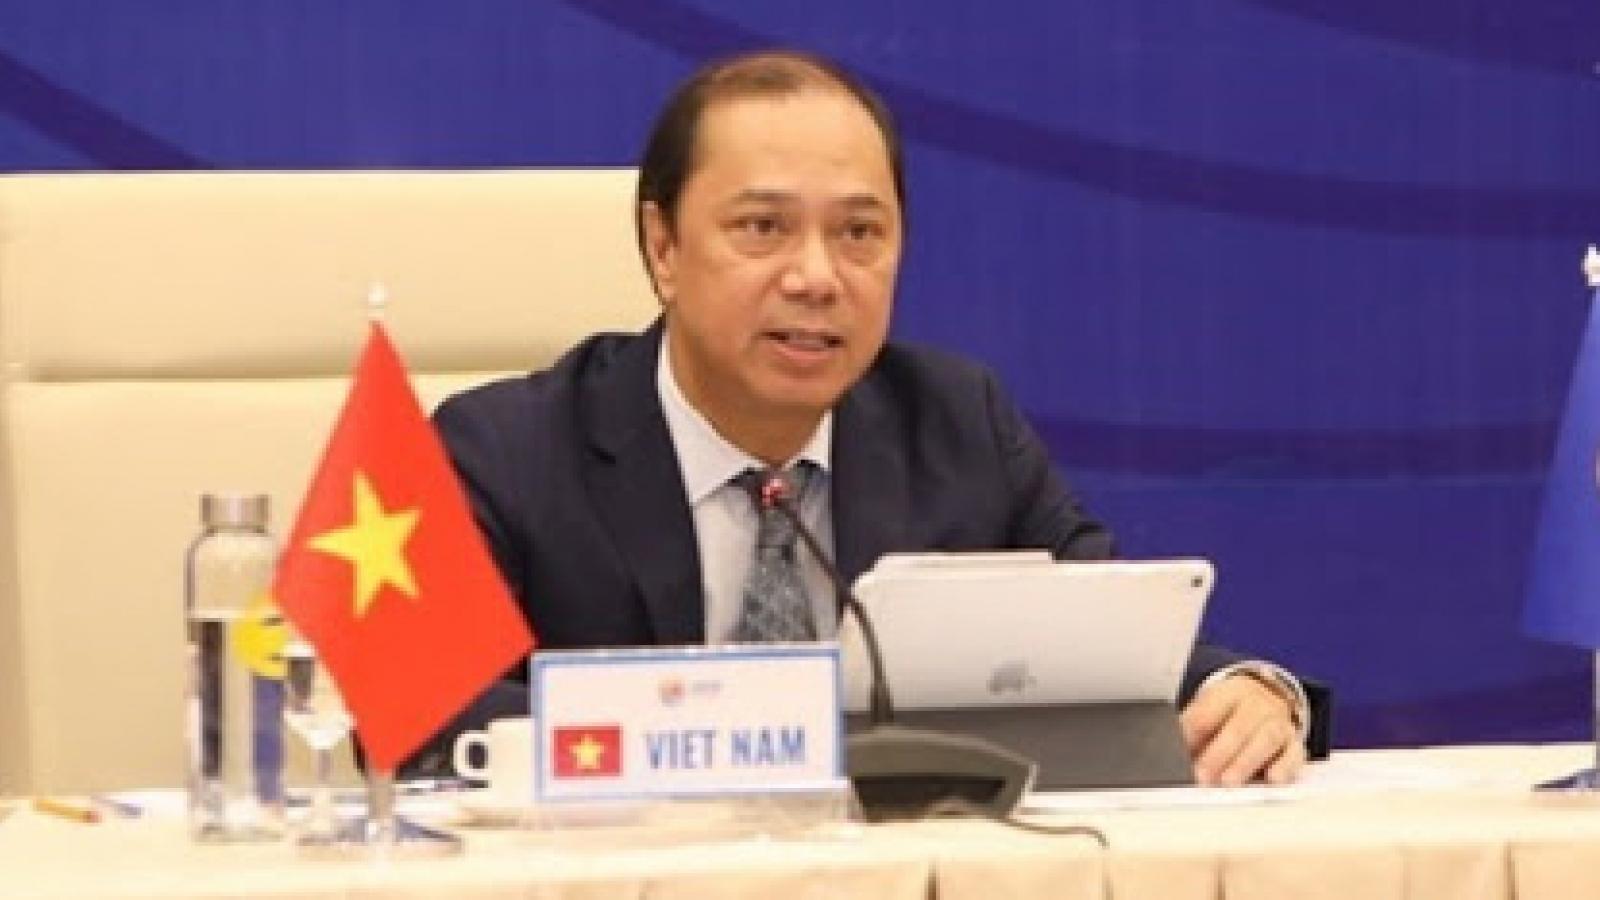 Deputy FM: Vietnam treasures ties with Germany